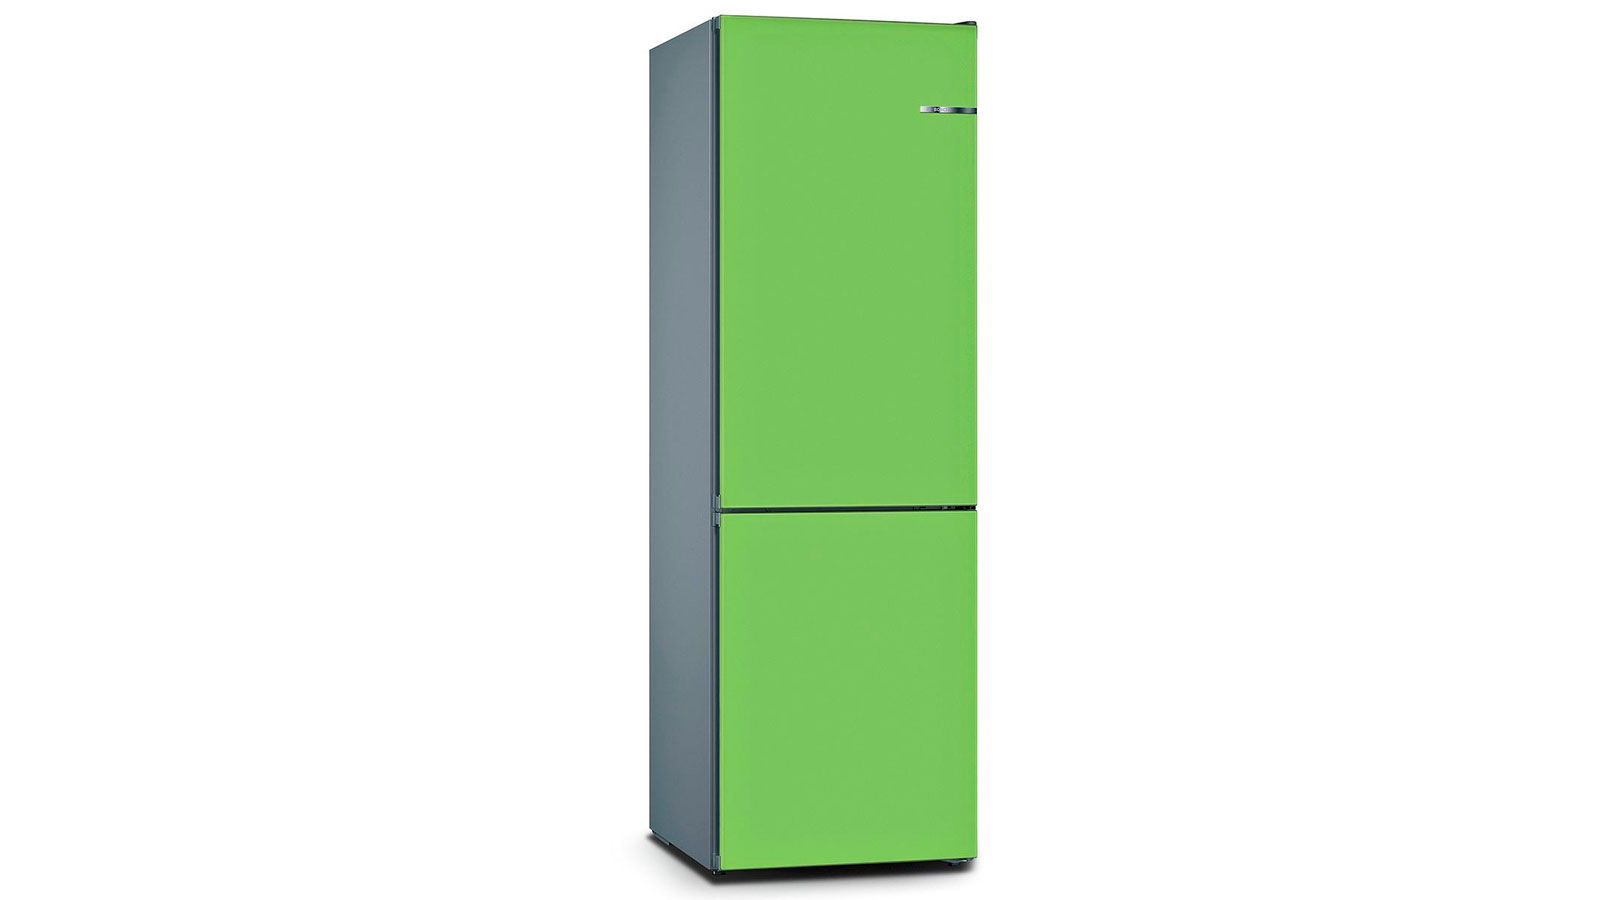 BOSCH 324L雙門雪櫃/配可更換門板 KVN36IH3BK-青檸綠